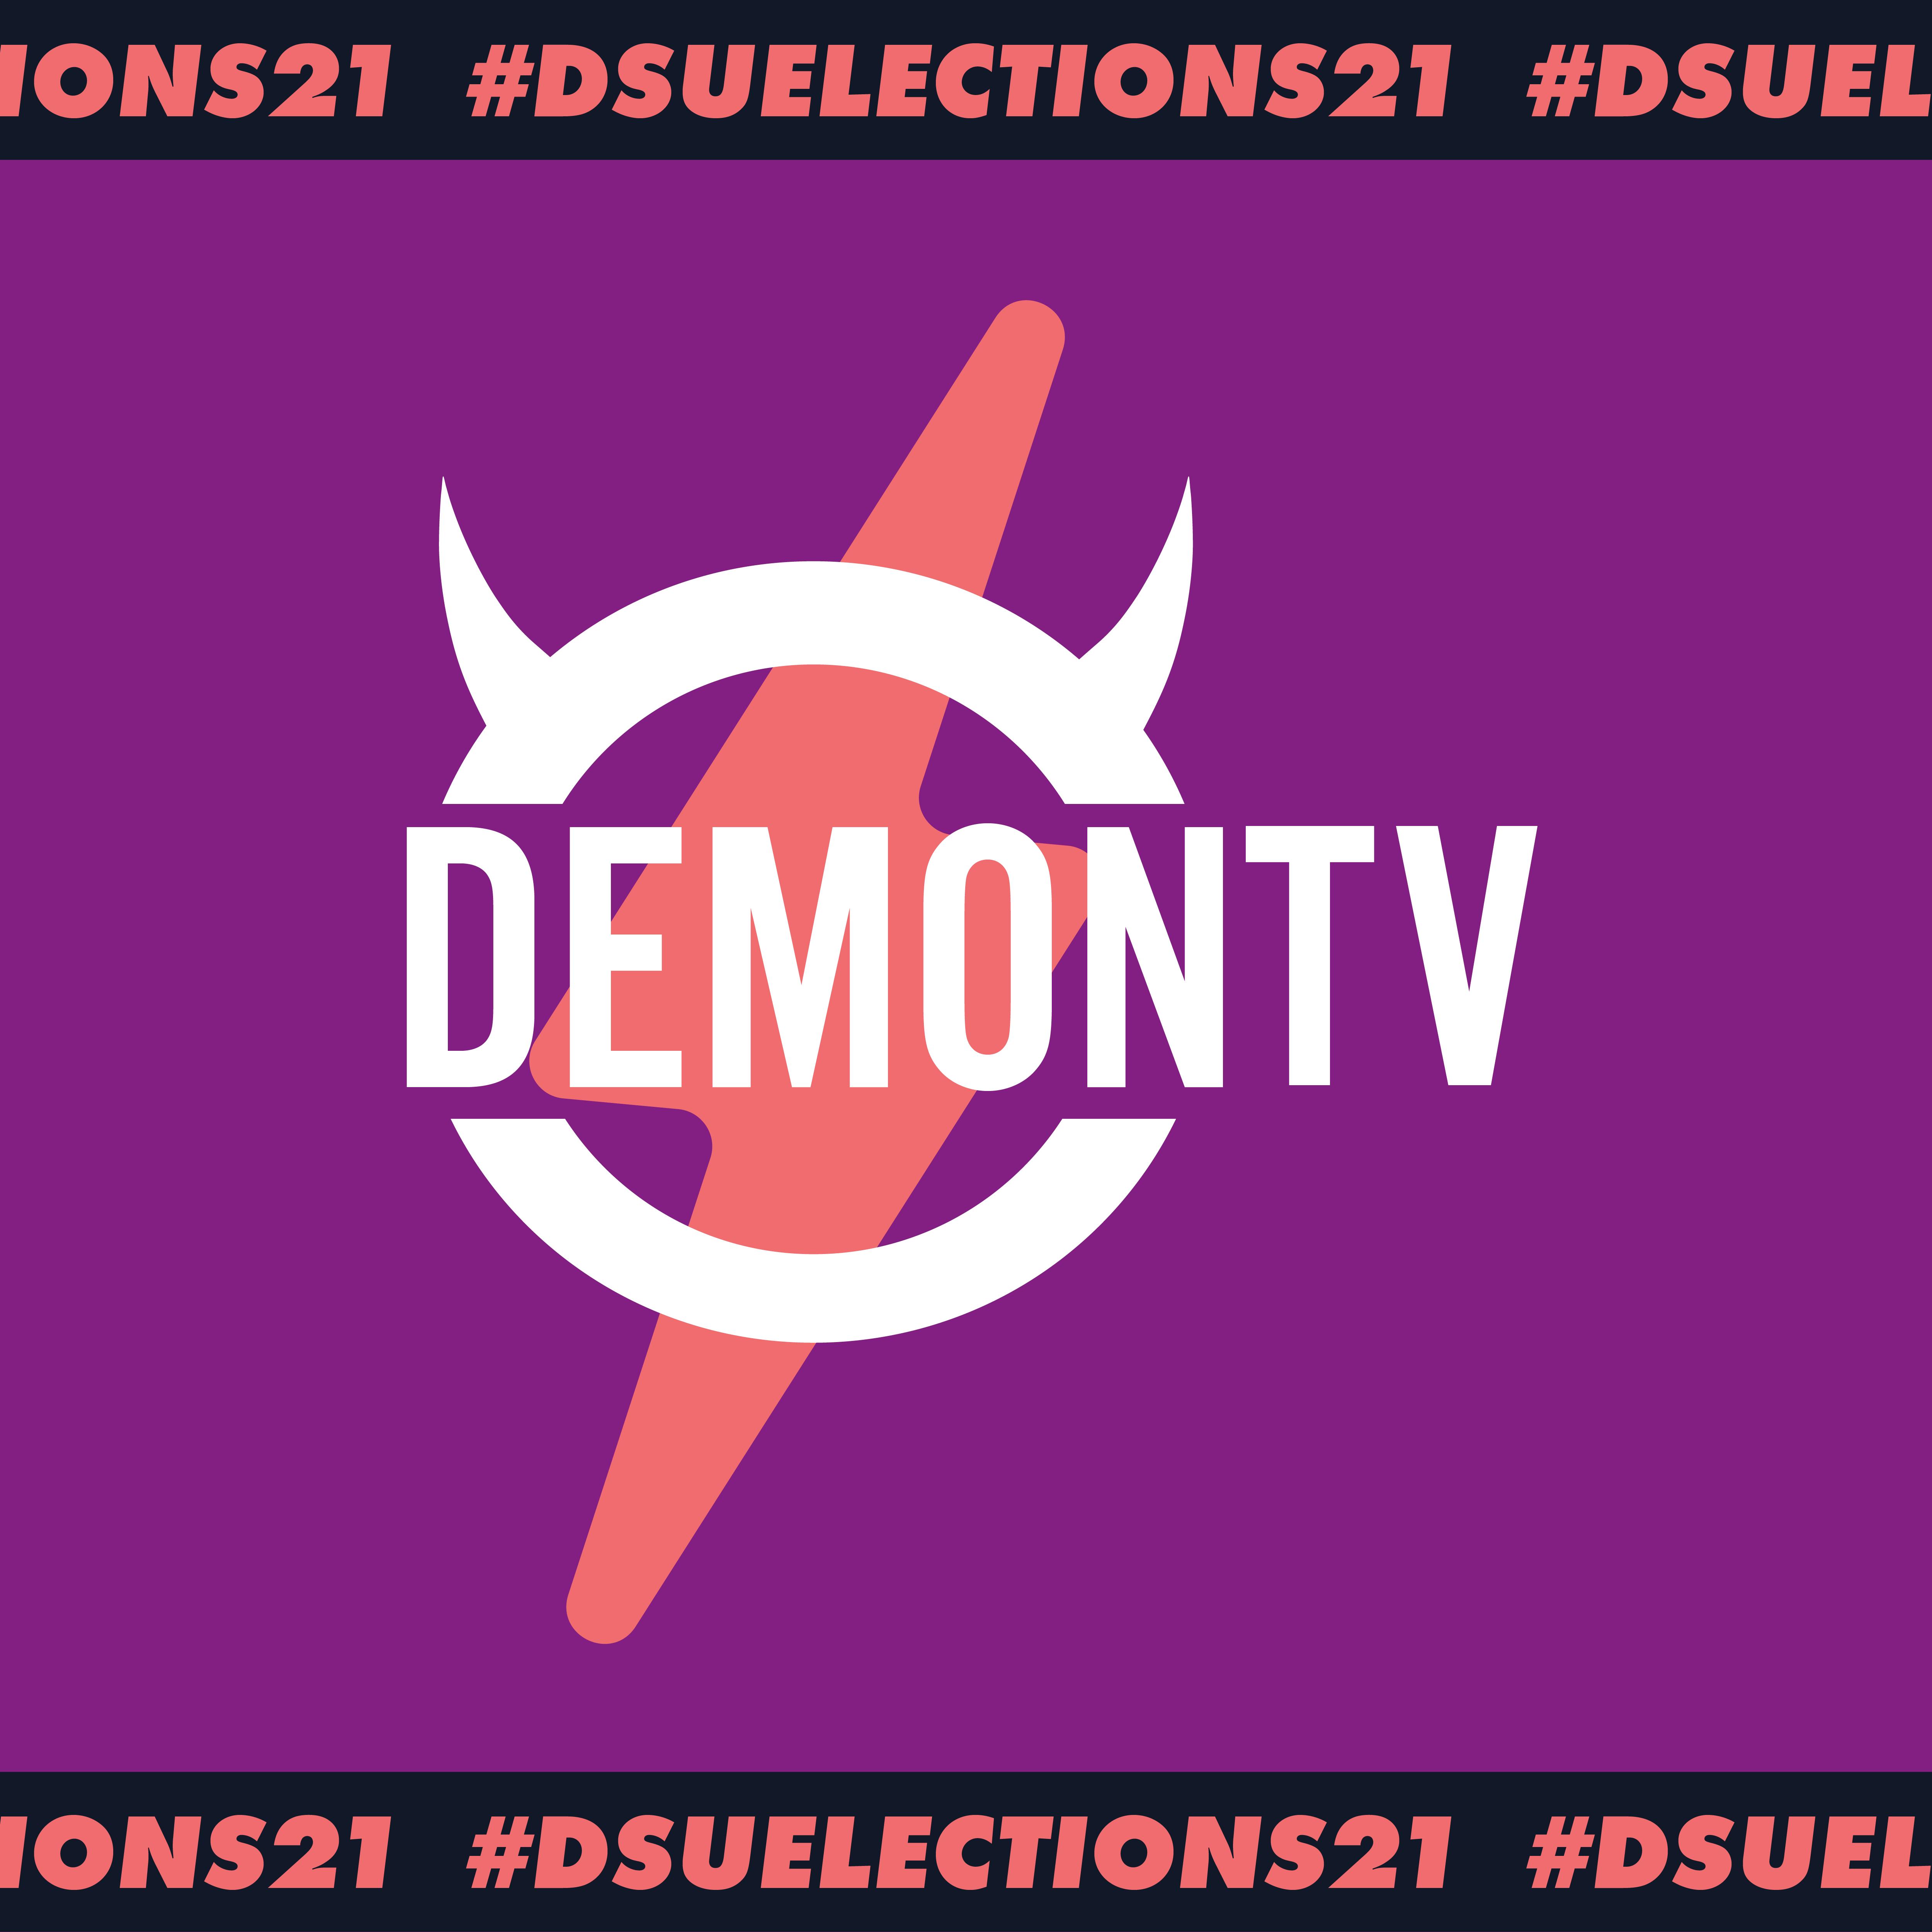 Demon tv